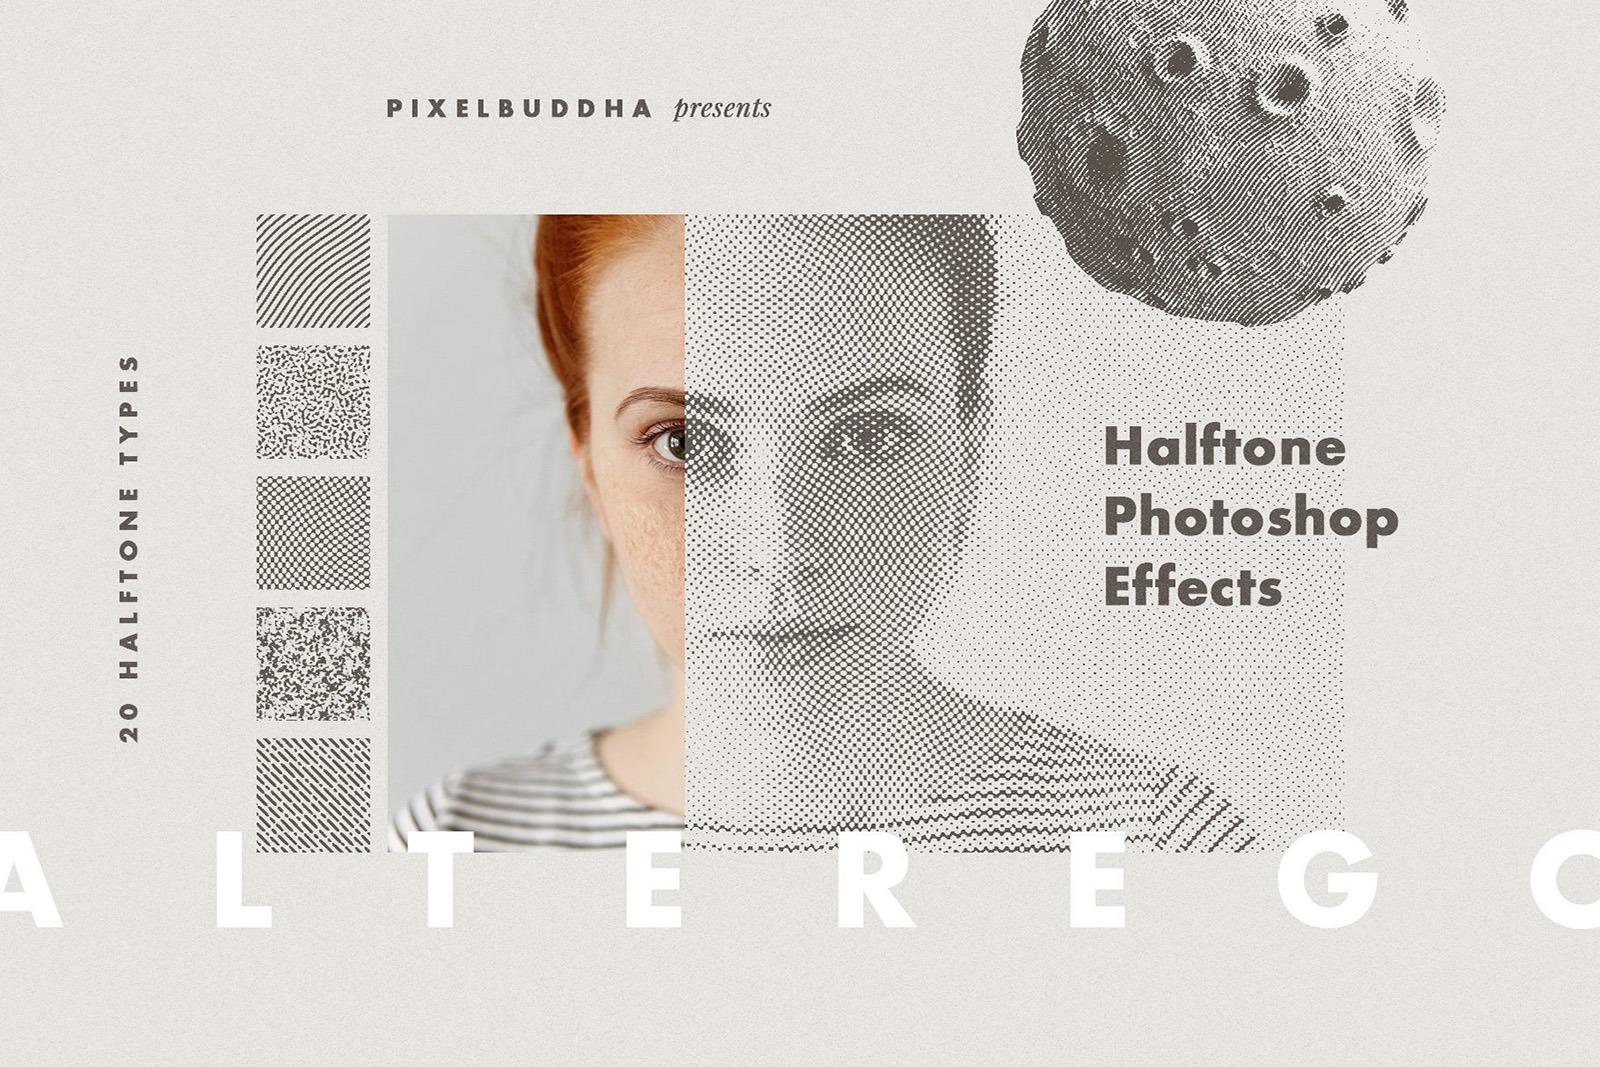 Alter Ego Halftone Photoshop Effect